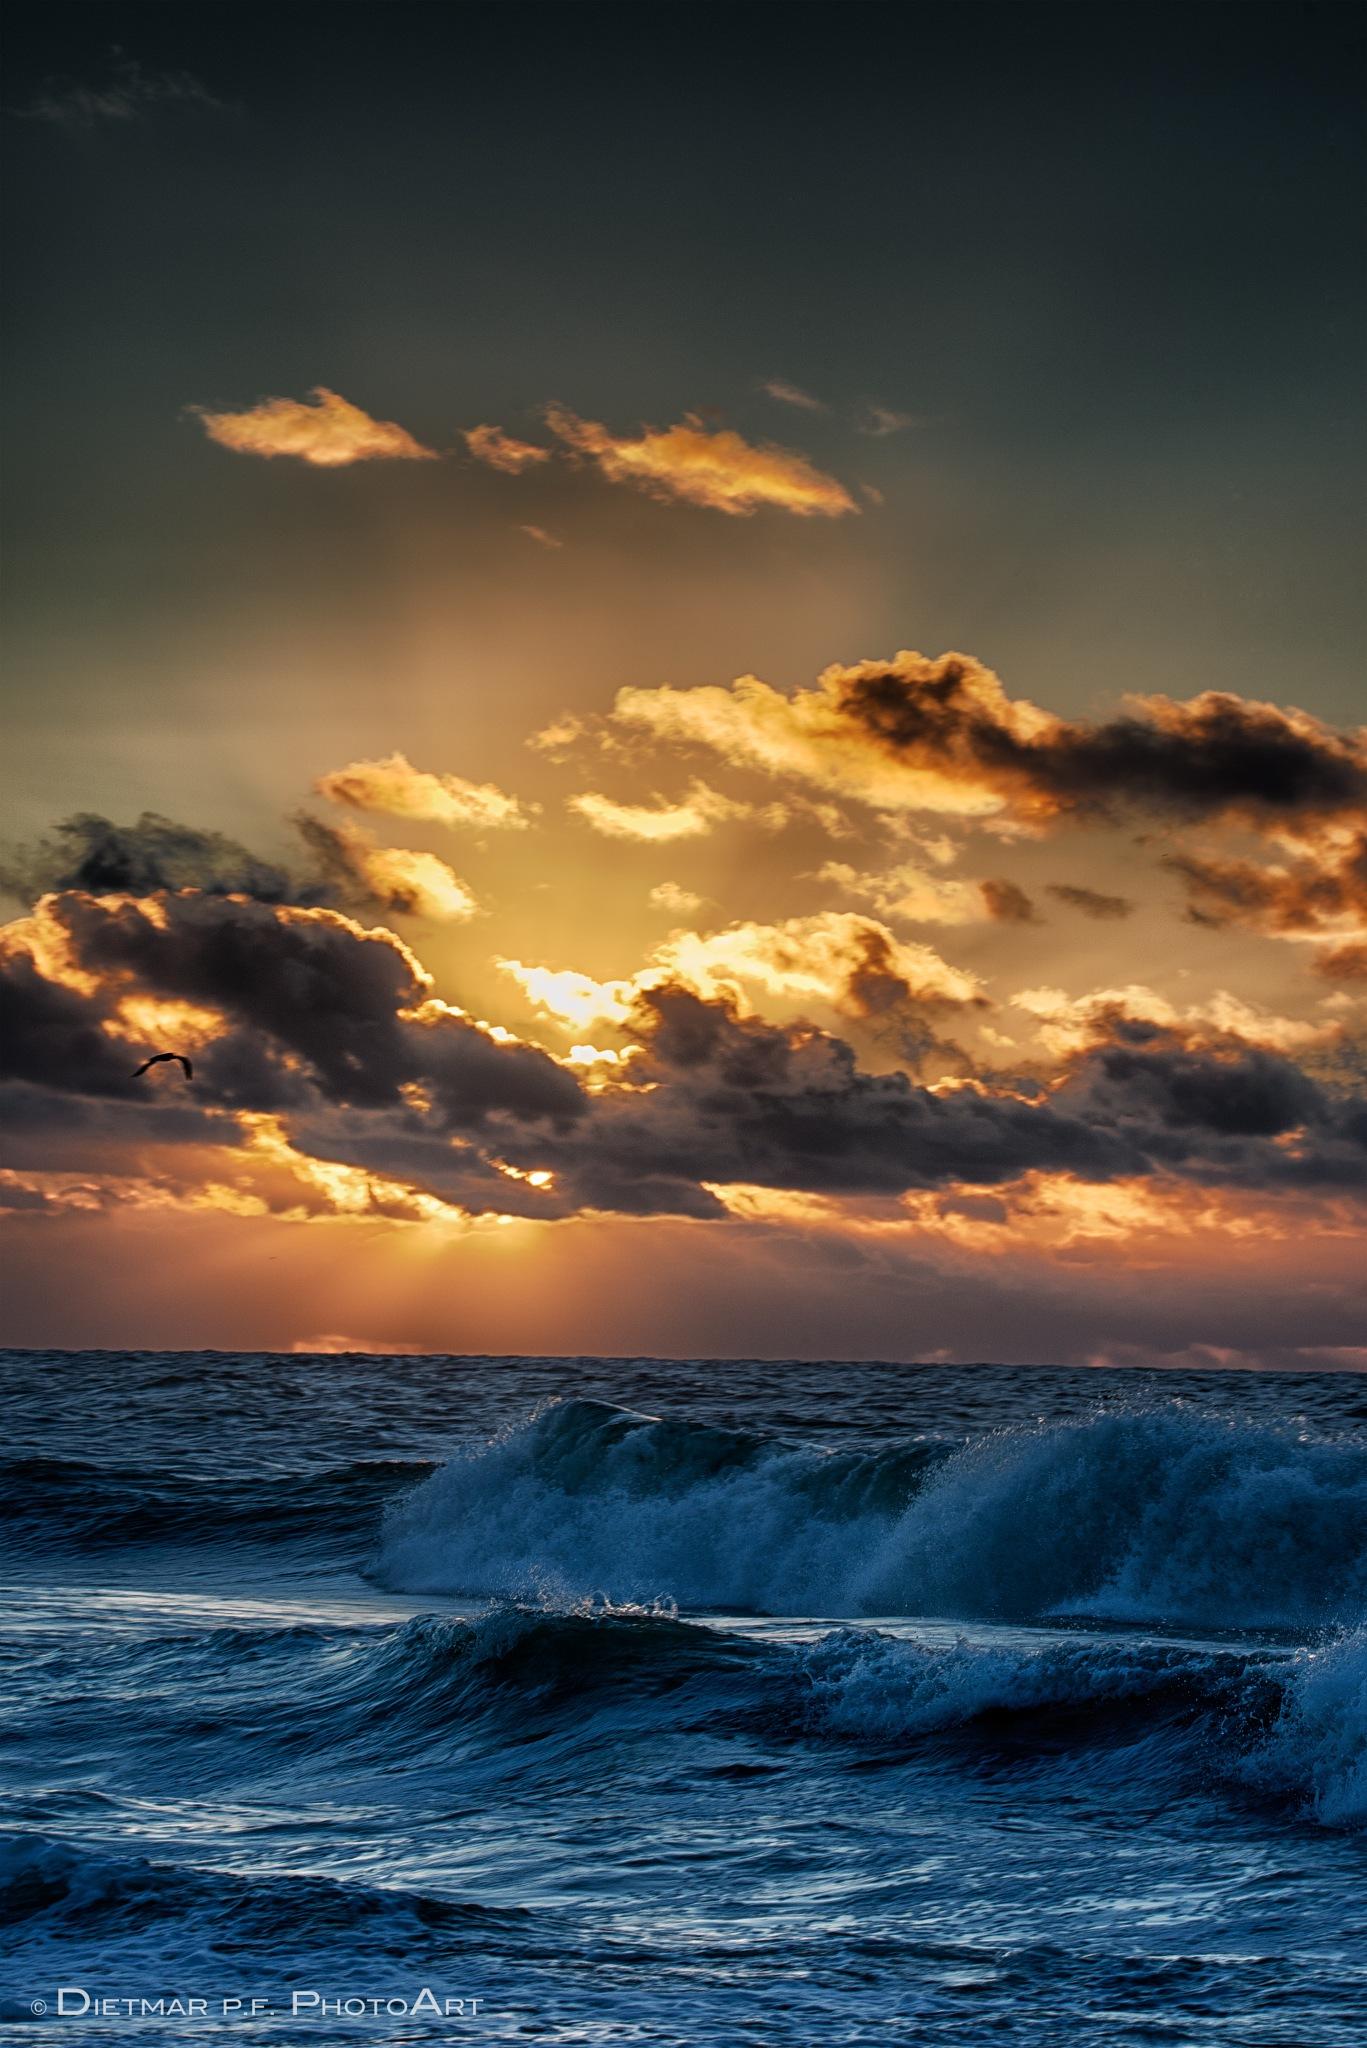 WAVES ... ♥ by ᗪᴵᴱᵀᗰᗩᖇ ᑭ.ᖴ. ᑭᕼᴼᵀᴼᗩᖇᵀ